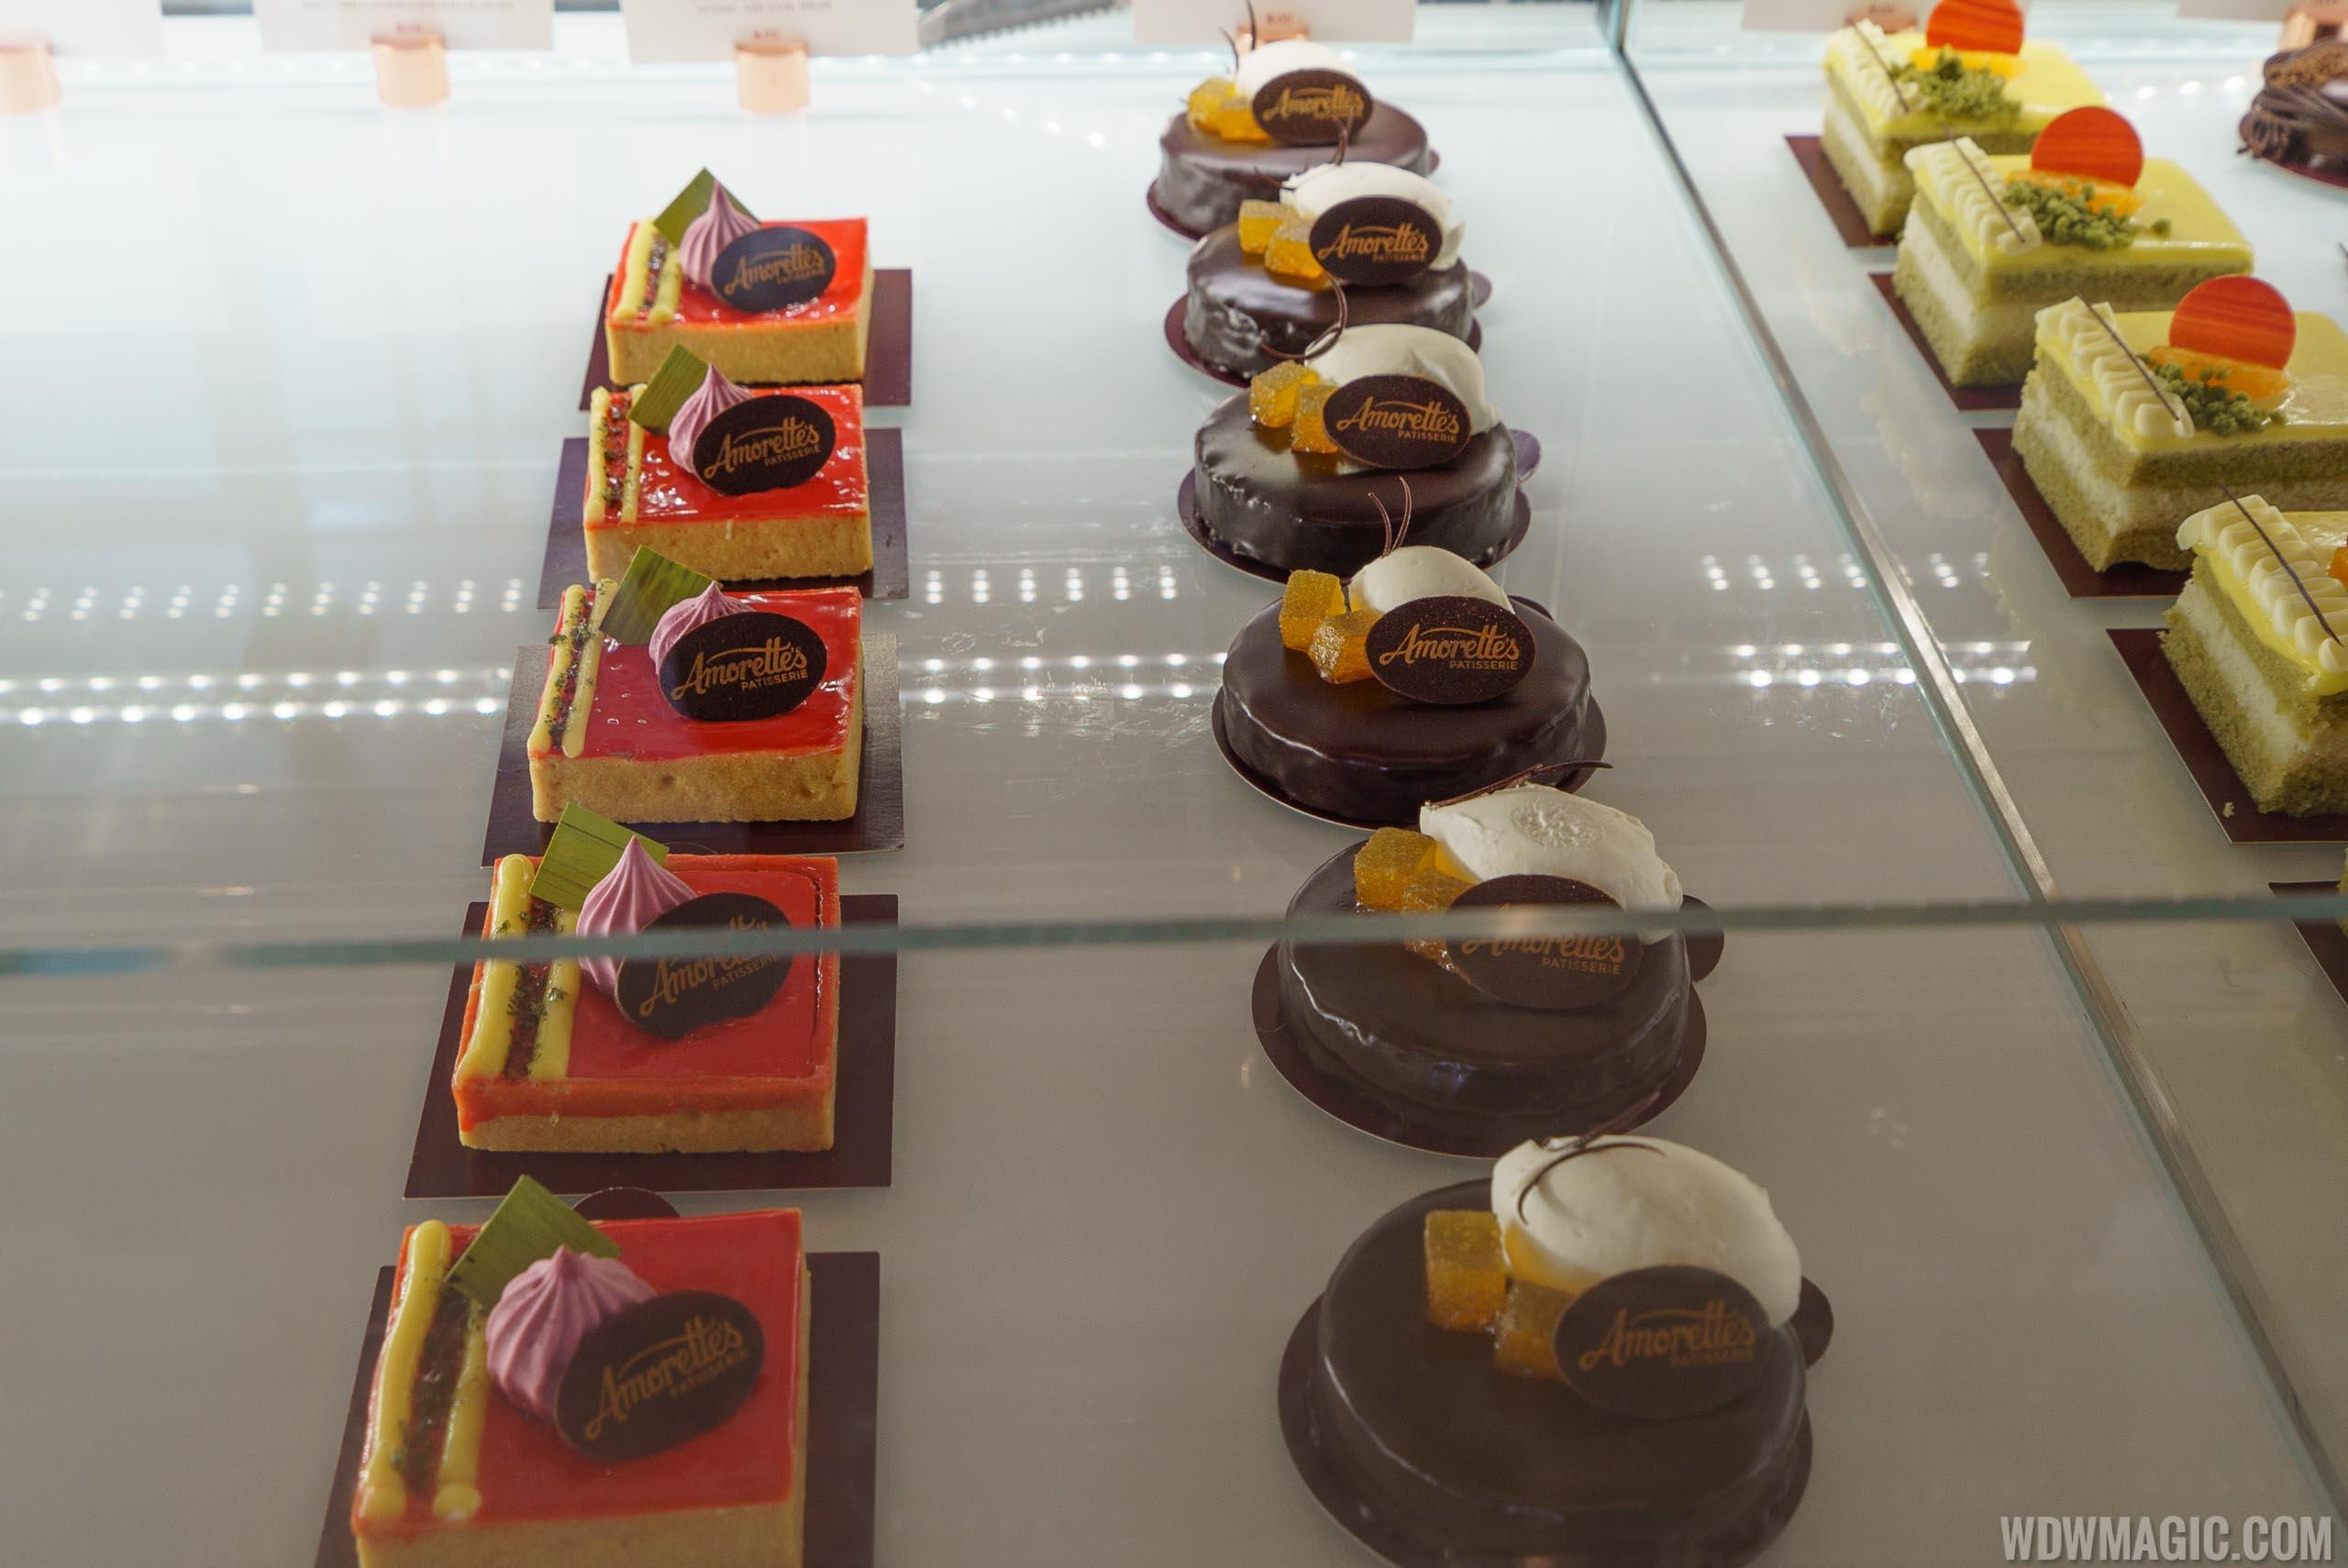 Amorette's Patisserie - Cakes